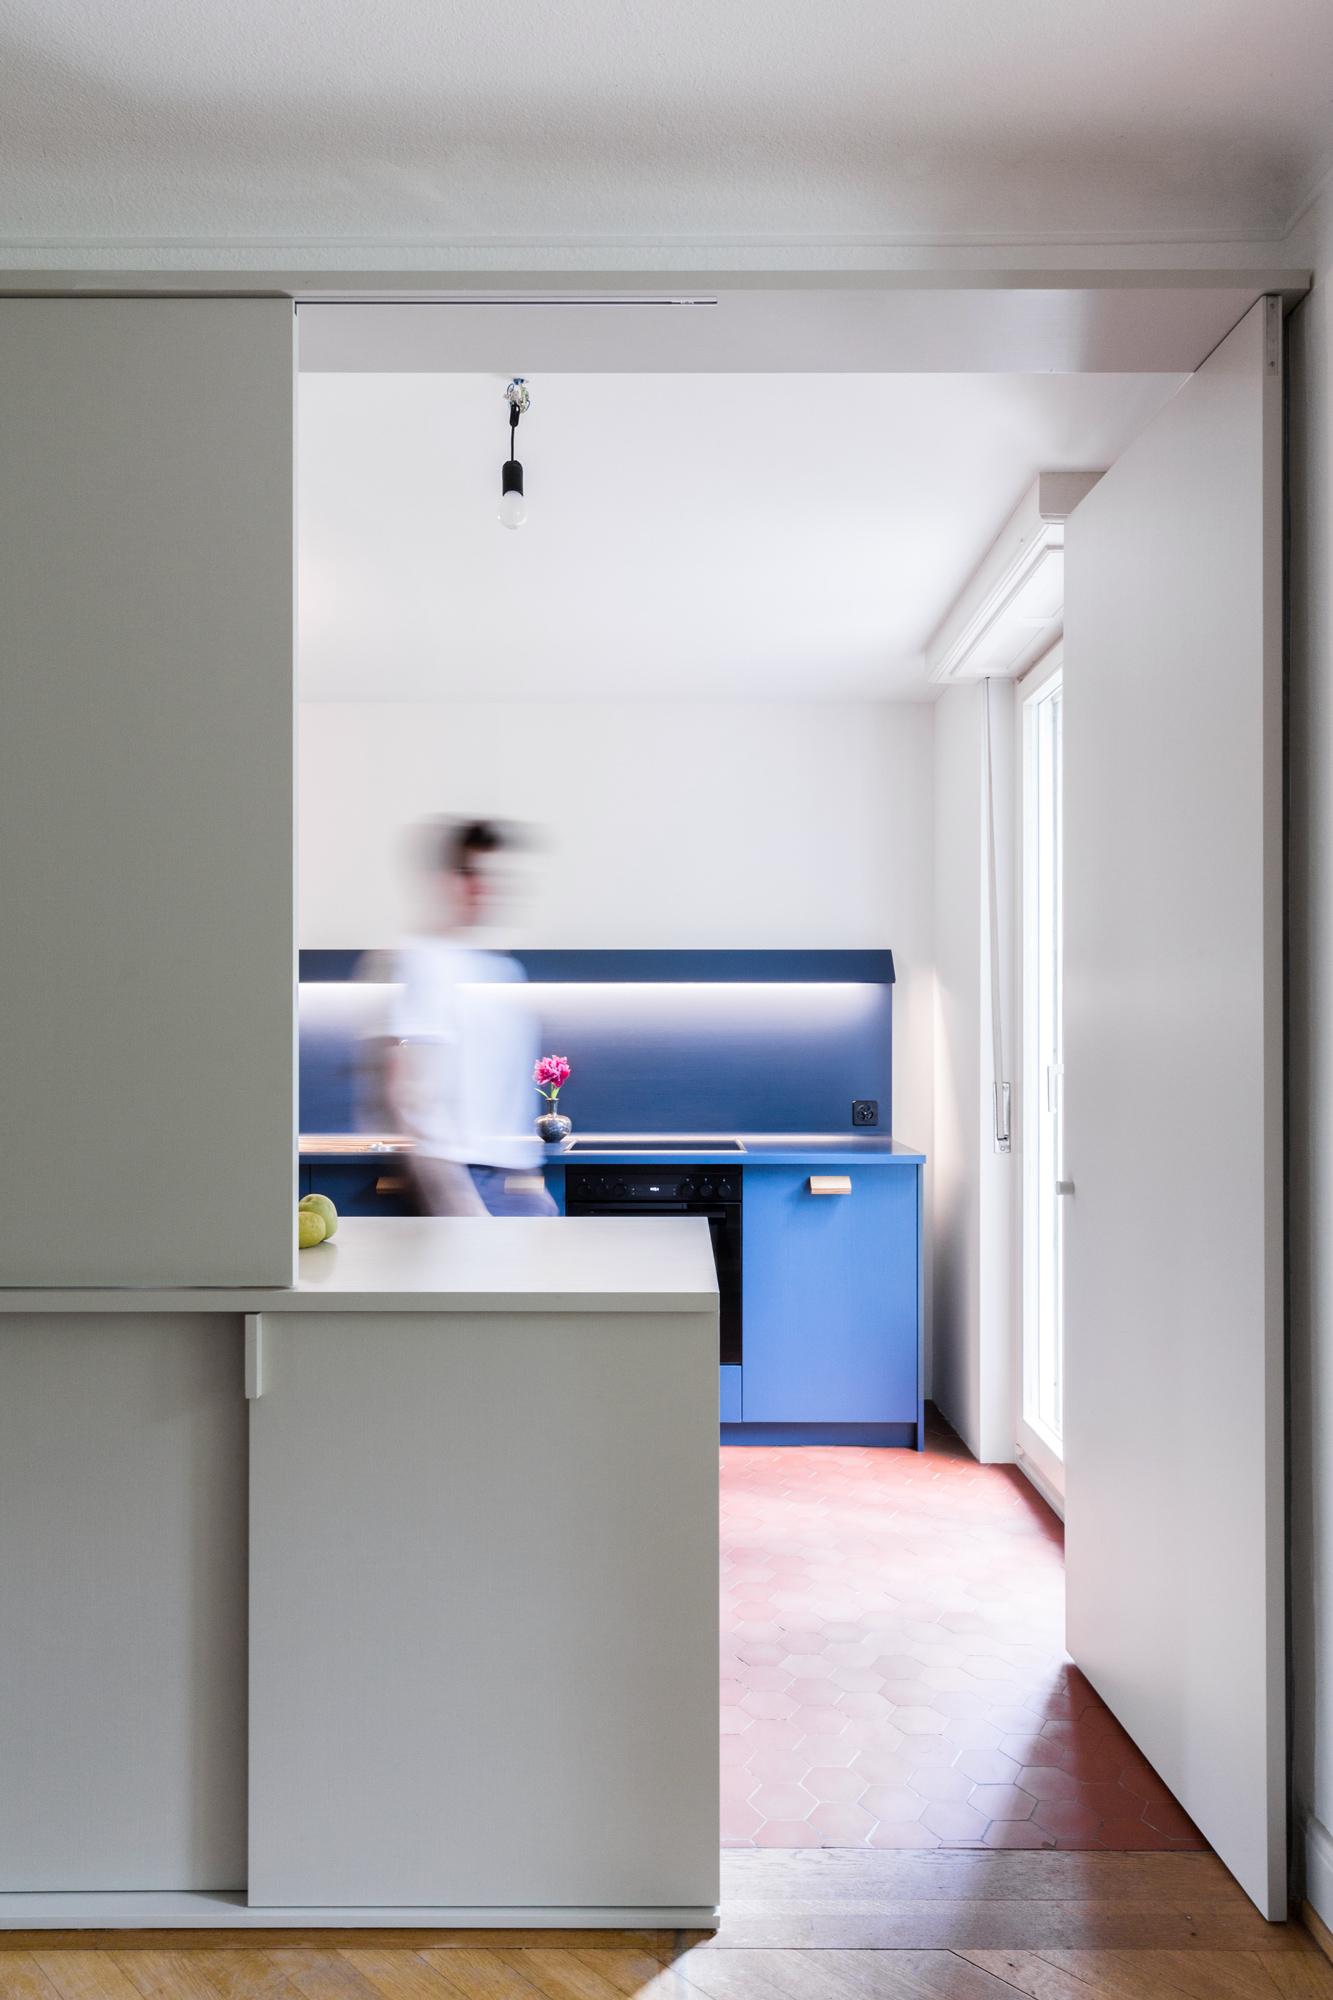 losgelöstes Küchenmöbel